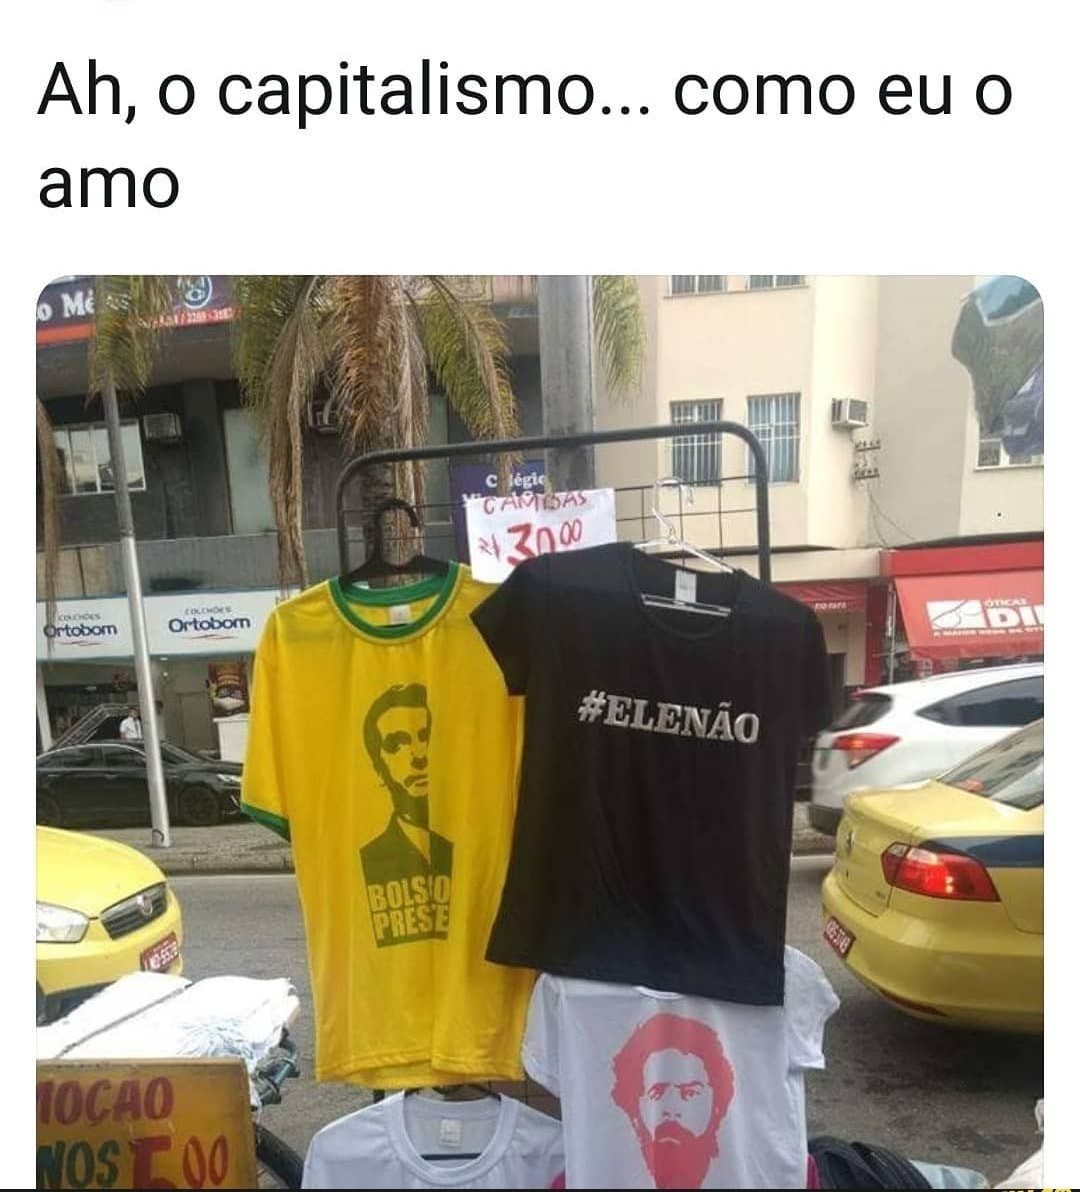 Bolsomito 2018 ✌️☺️✌️ - meme